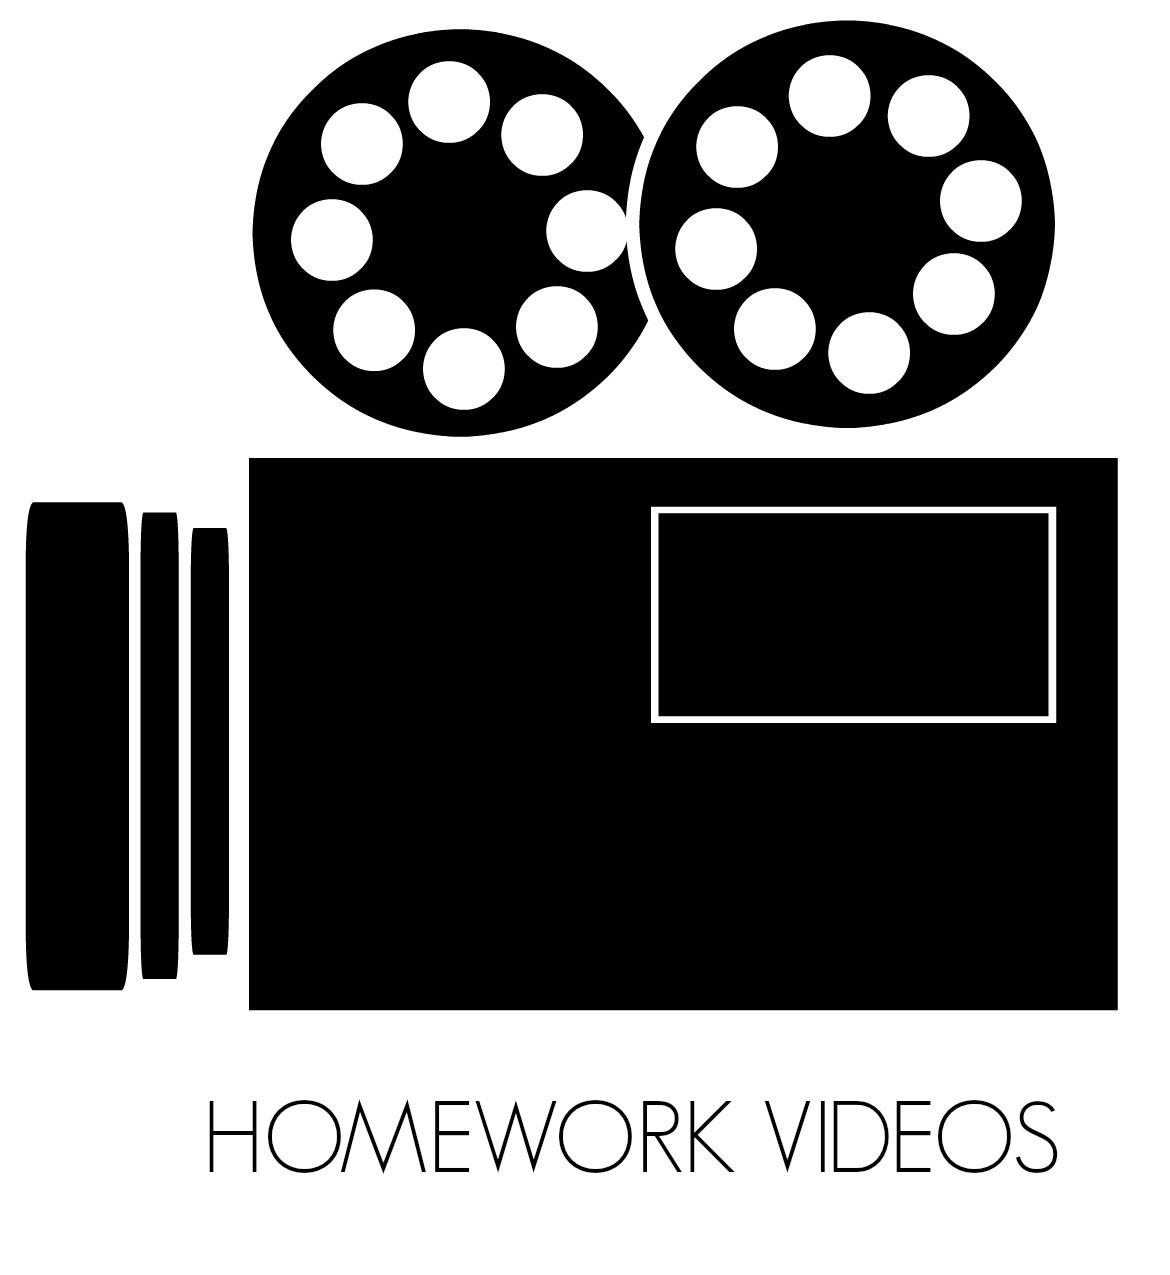 homework video CAPS ICON.jpg